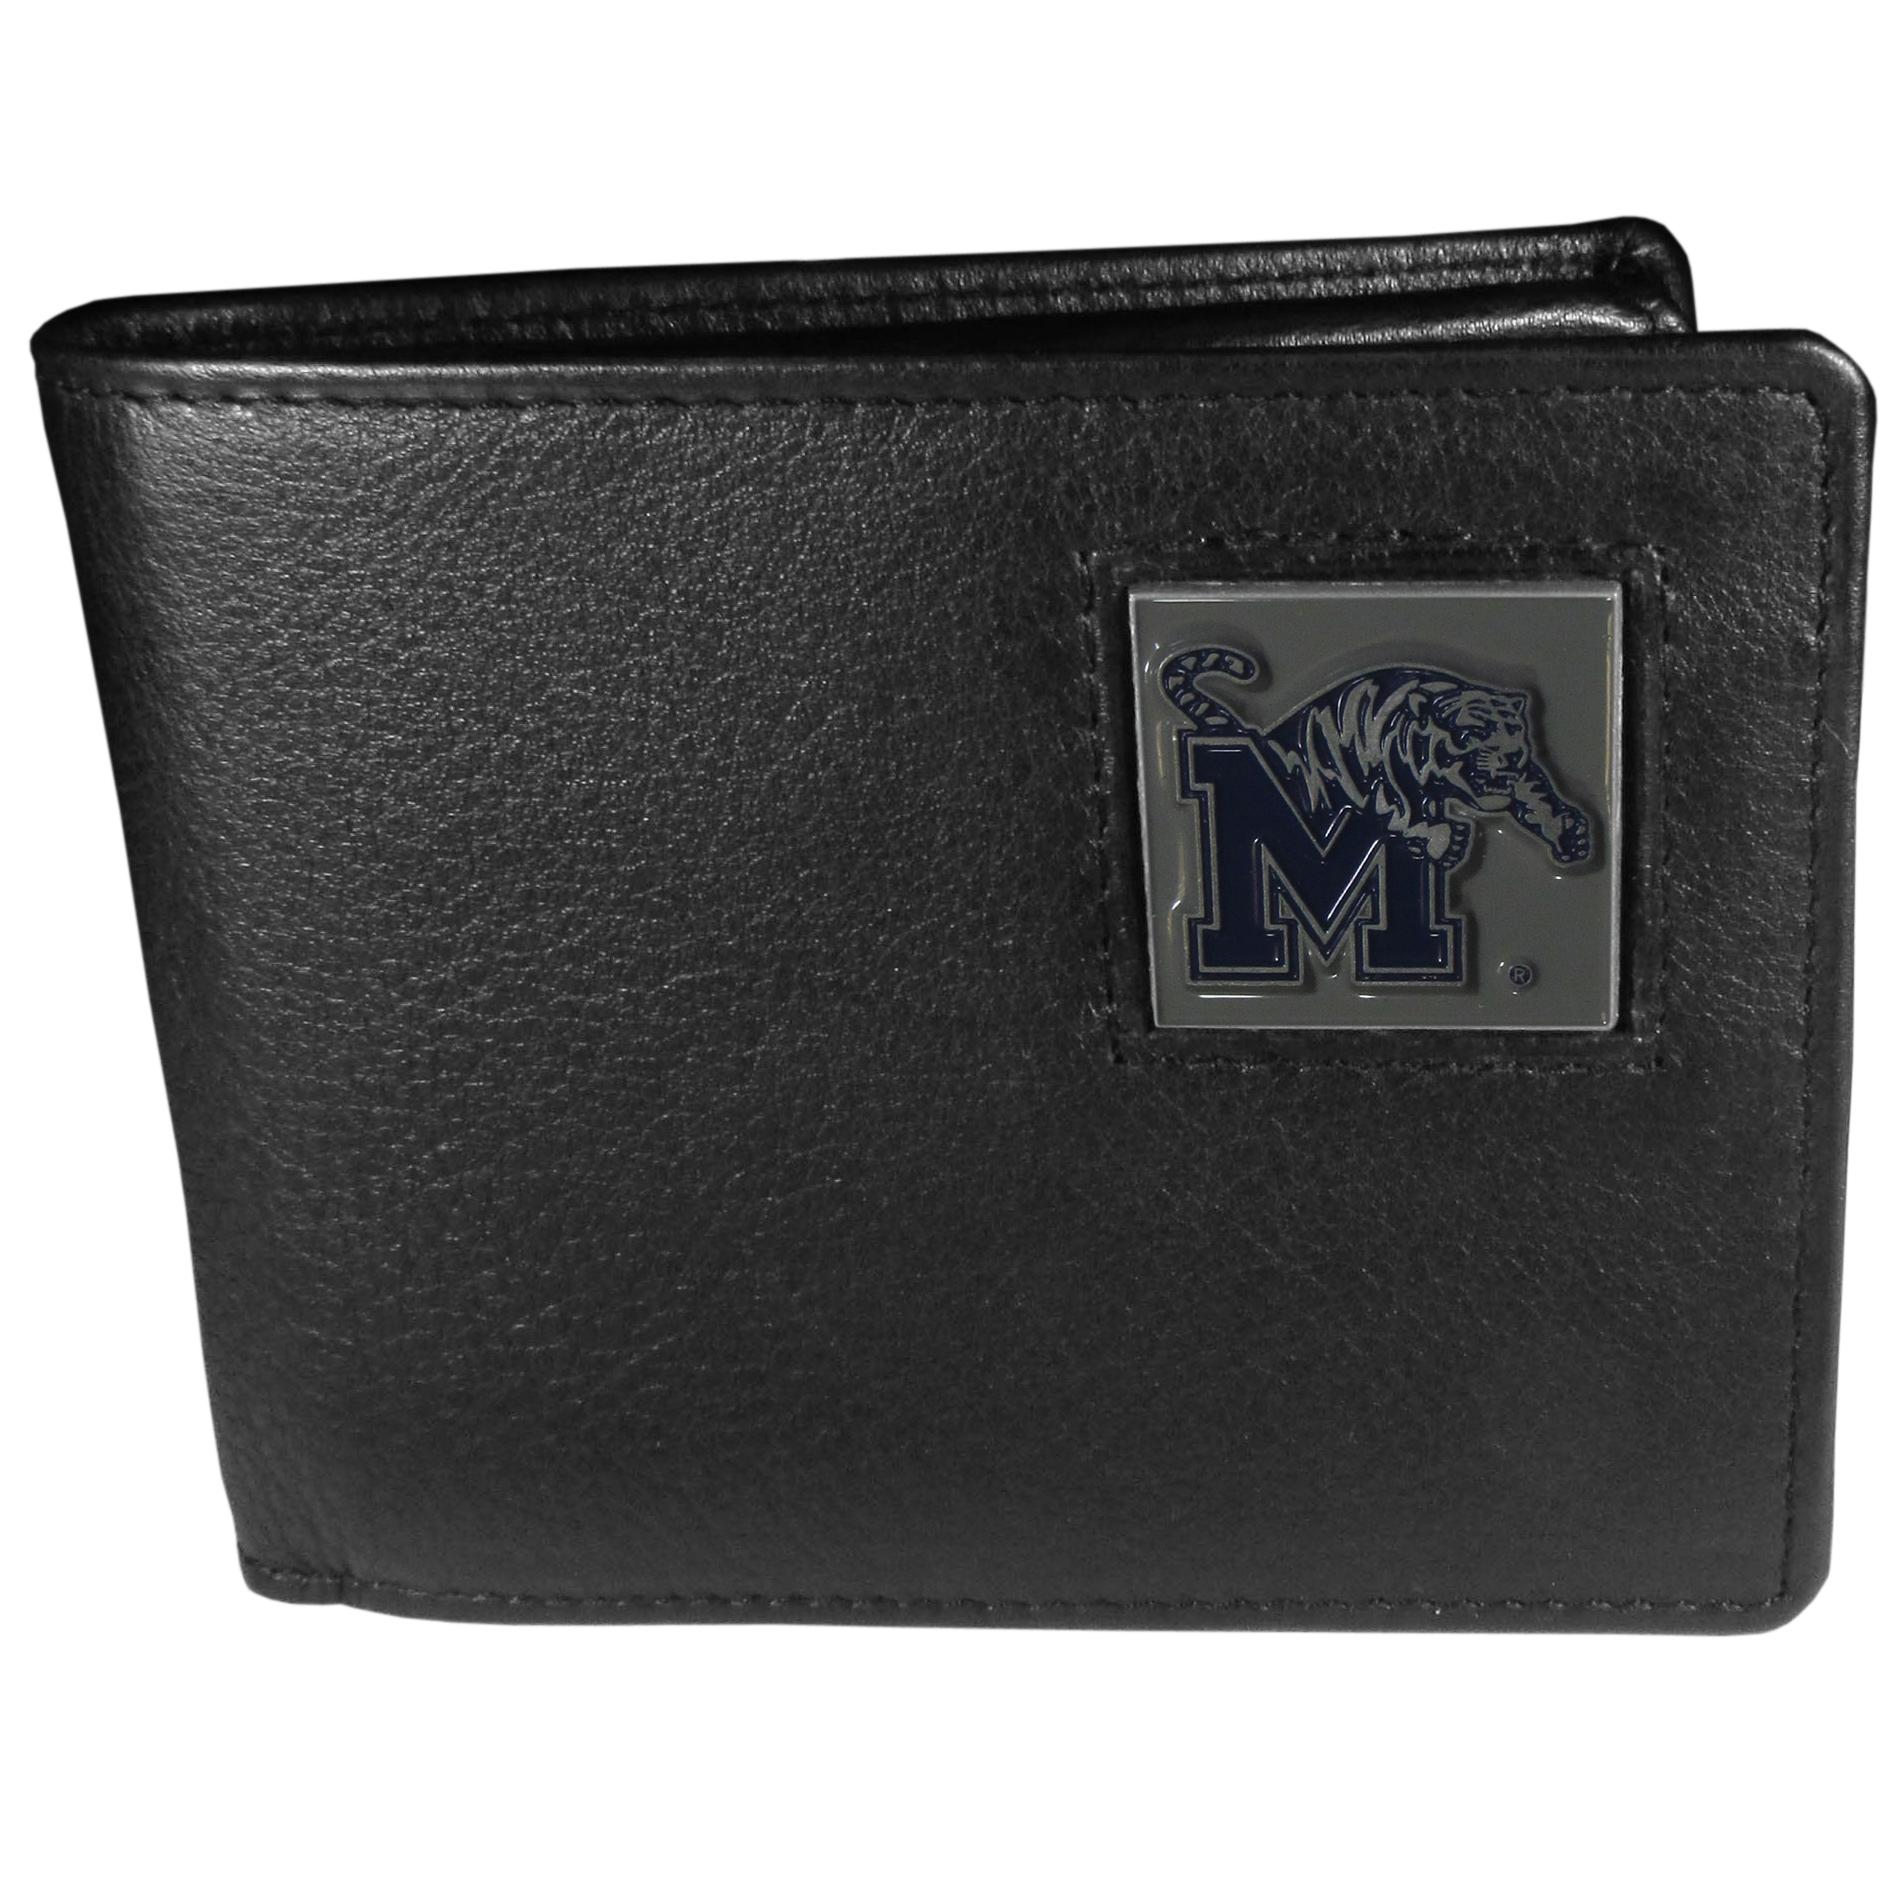 Planet Sports Team Memphis Tigers Leather Bi Fold Wallet